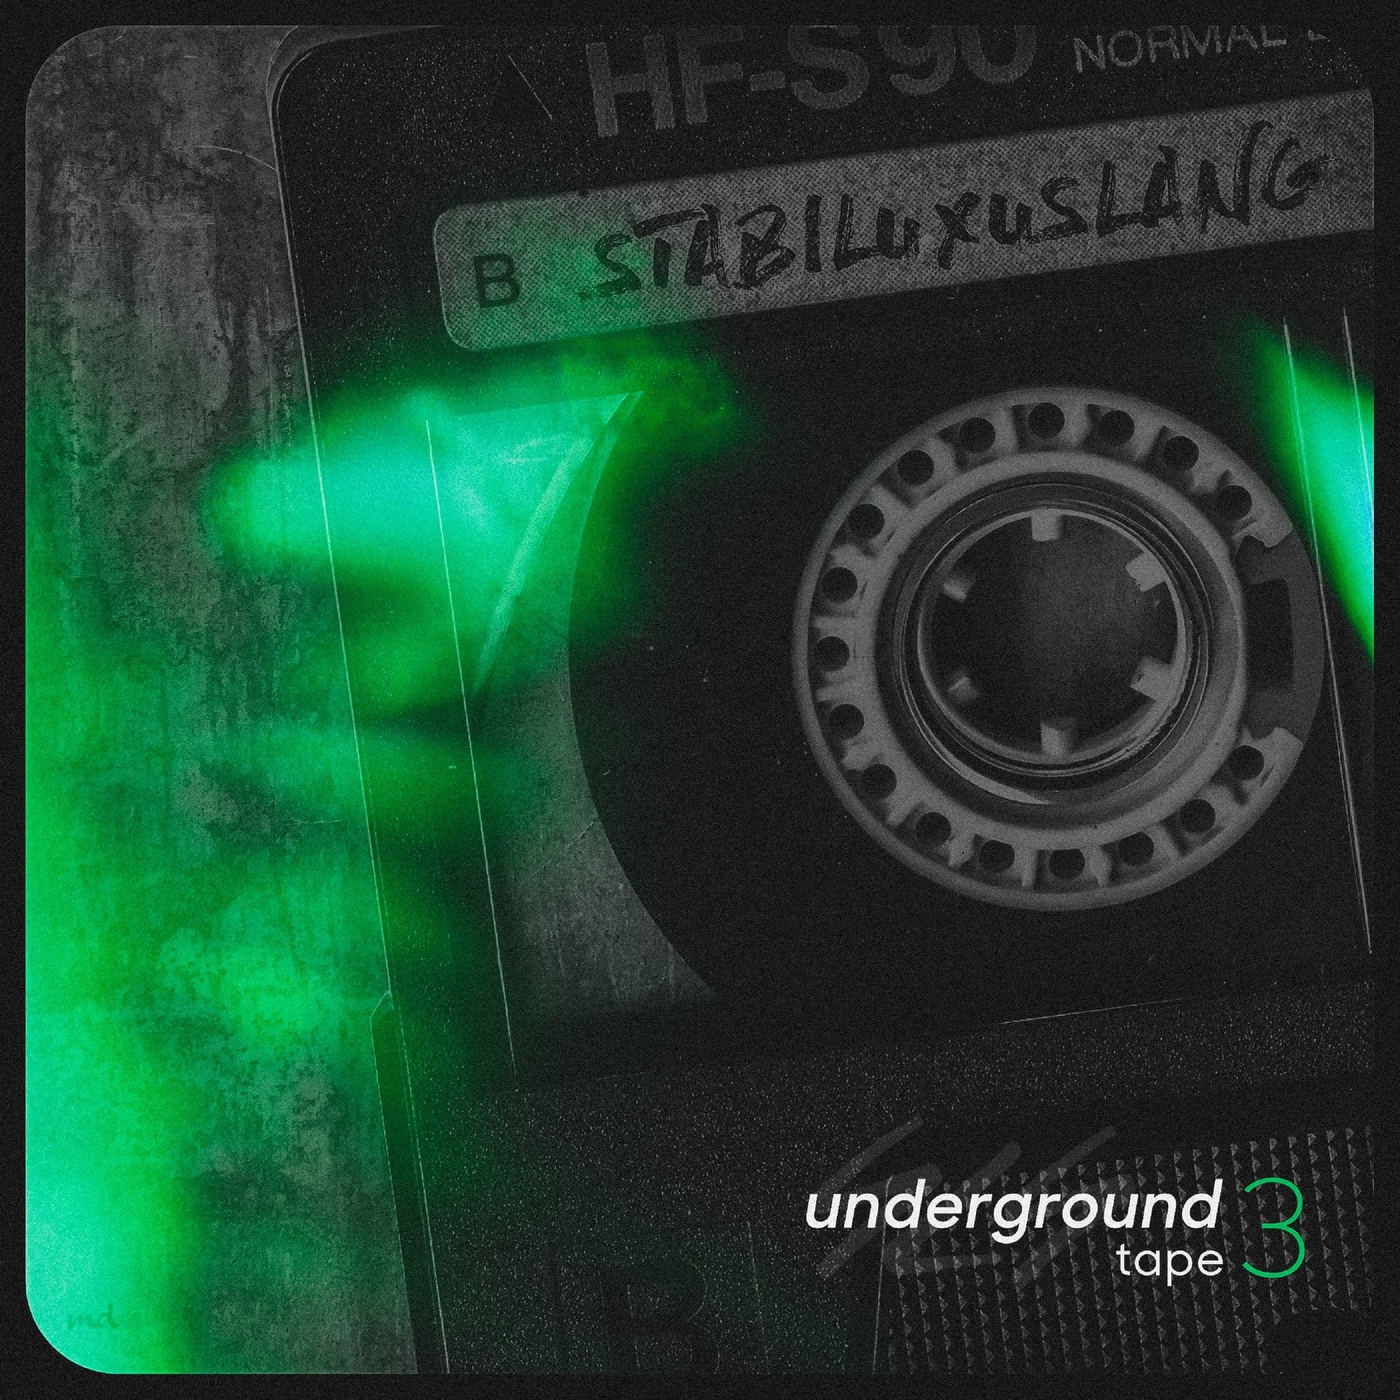 SLS Underground Tape3 - Goldfinger